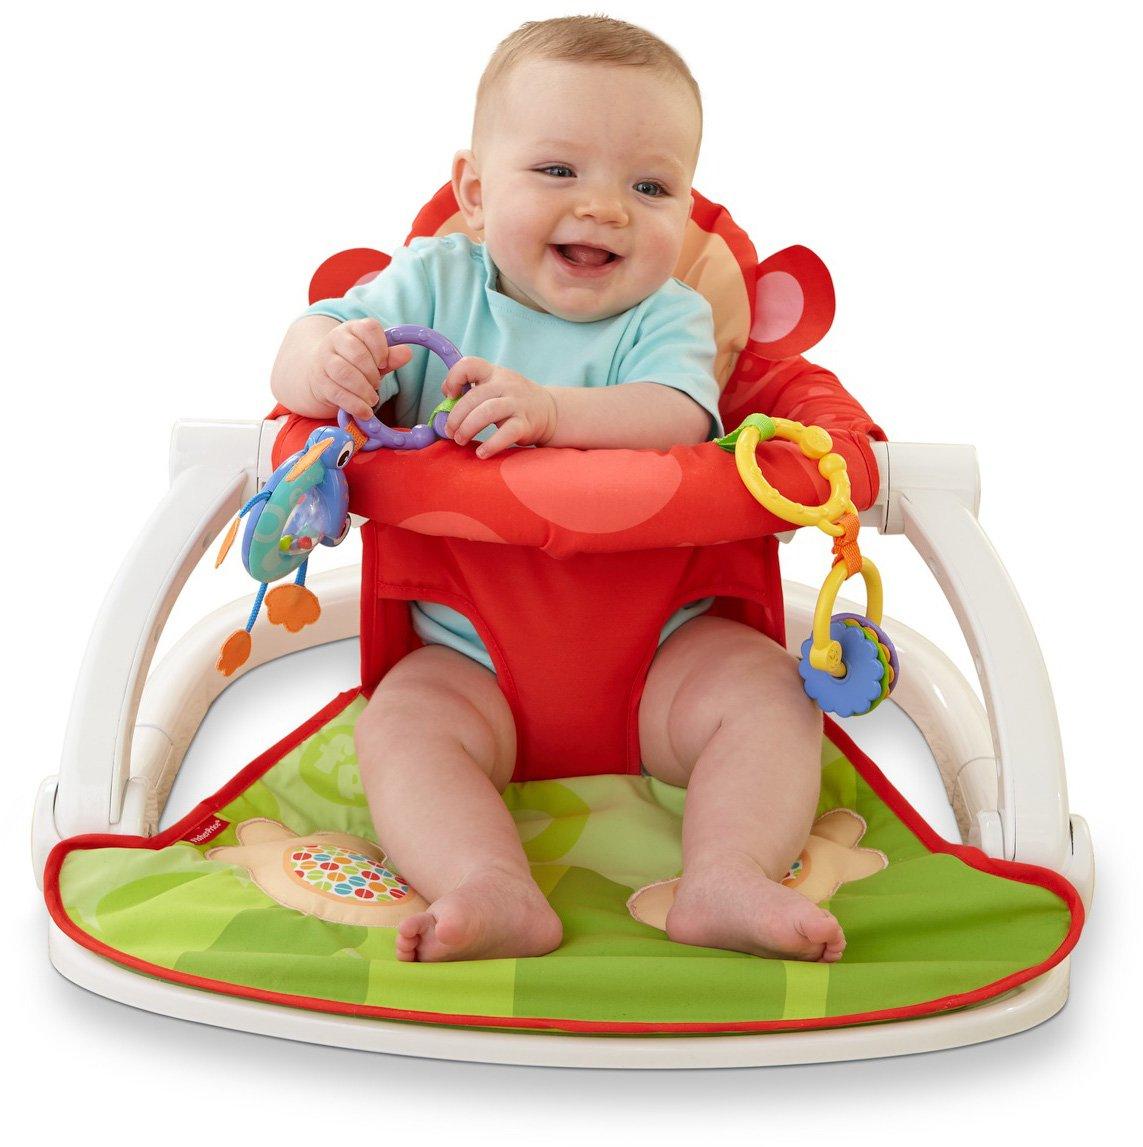 plush giraffe animal baby plush toy developmental interactive toy infant baby development soft. Black Bedroom Furniture Sets. Home Design Ideas